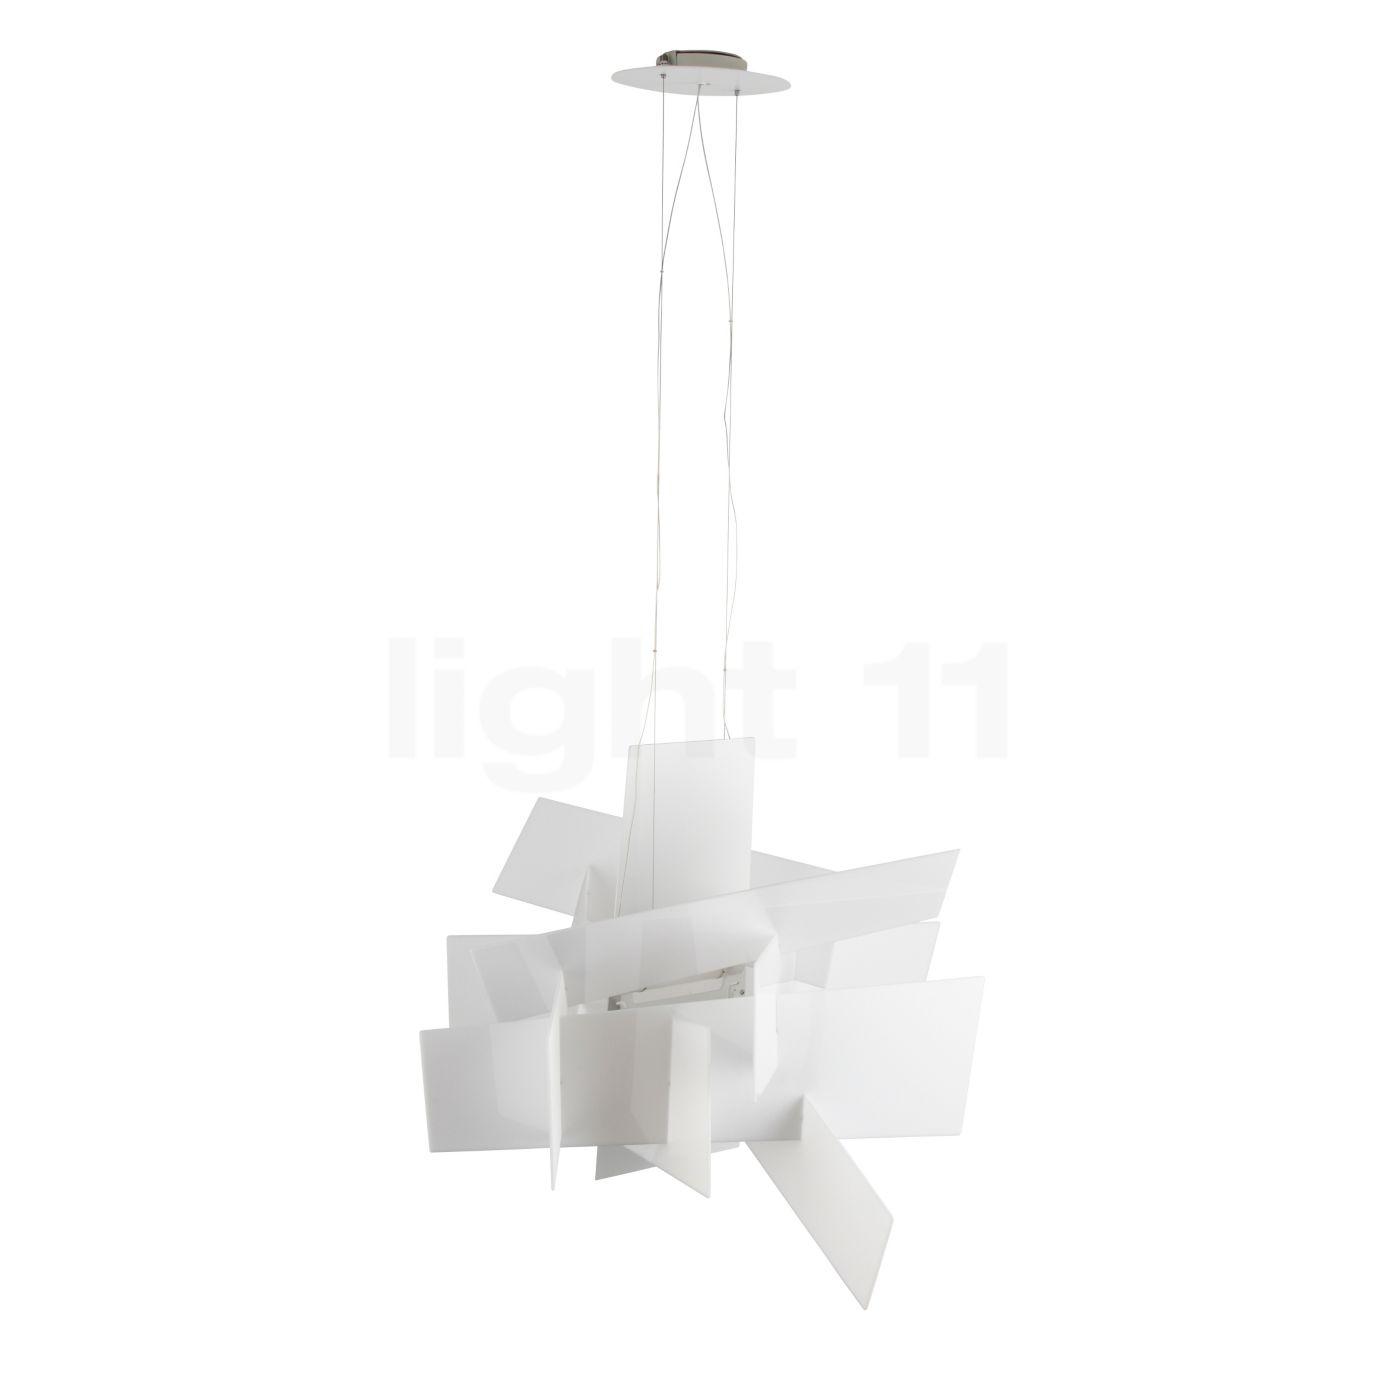 Foscarini Big Bang Sospensione LED Pendant lights